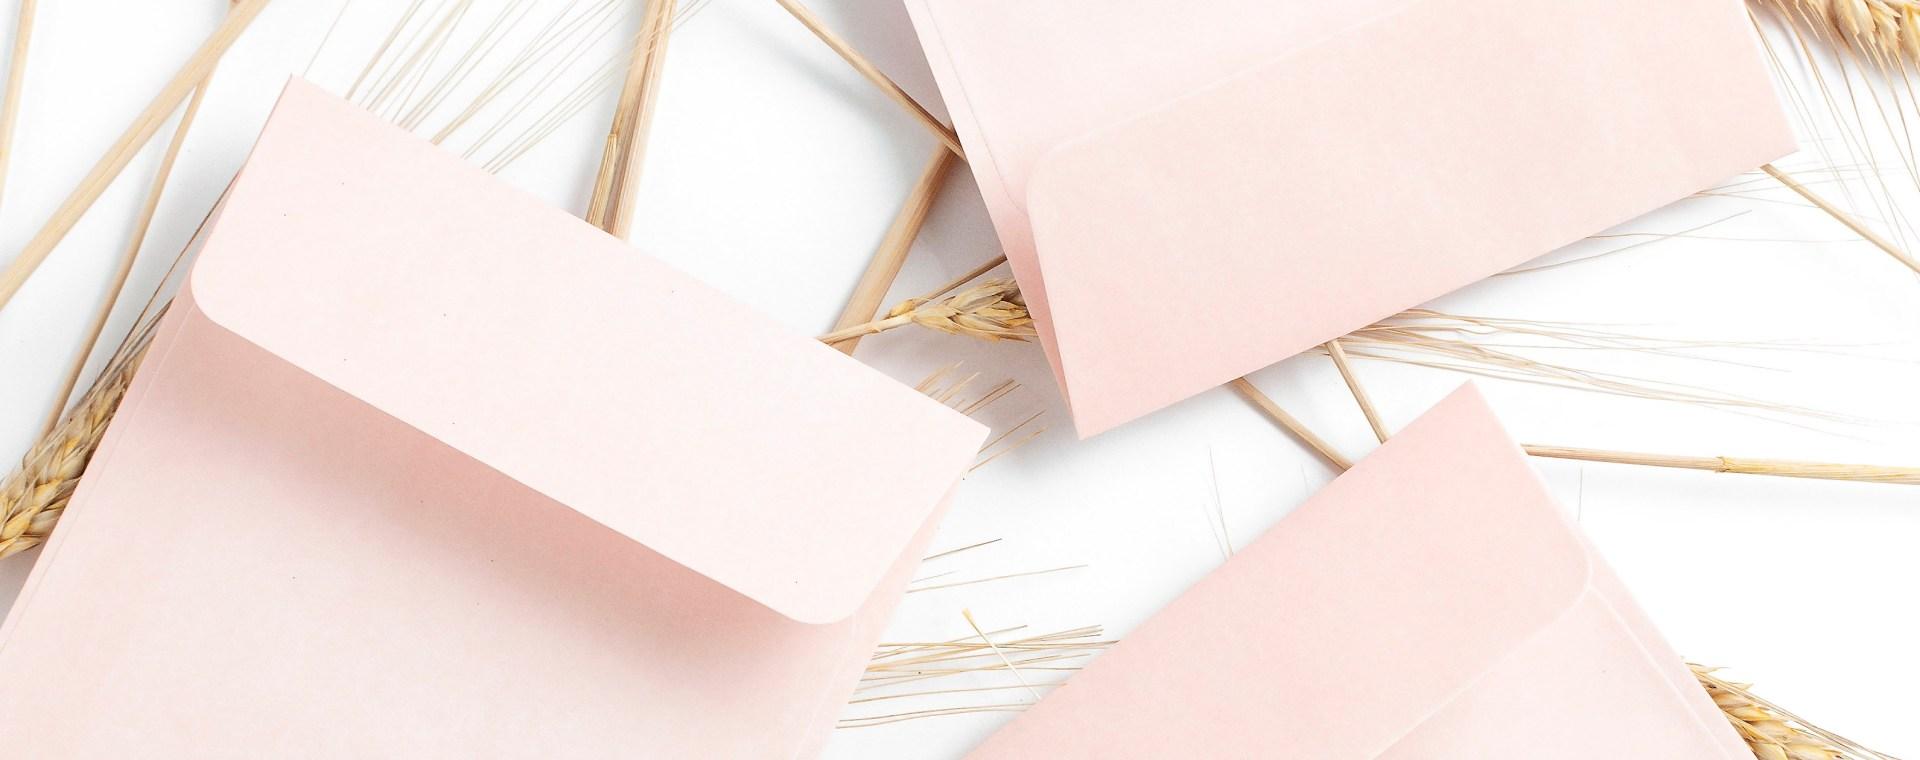 pink notepads